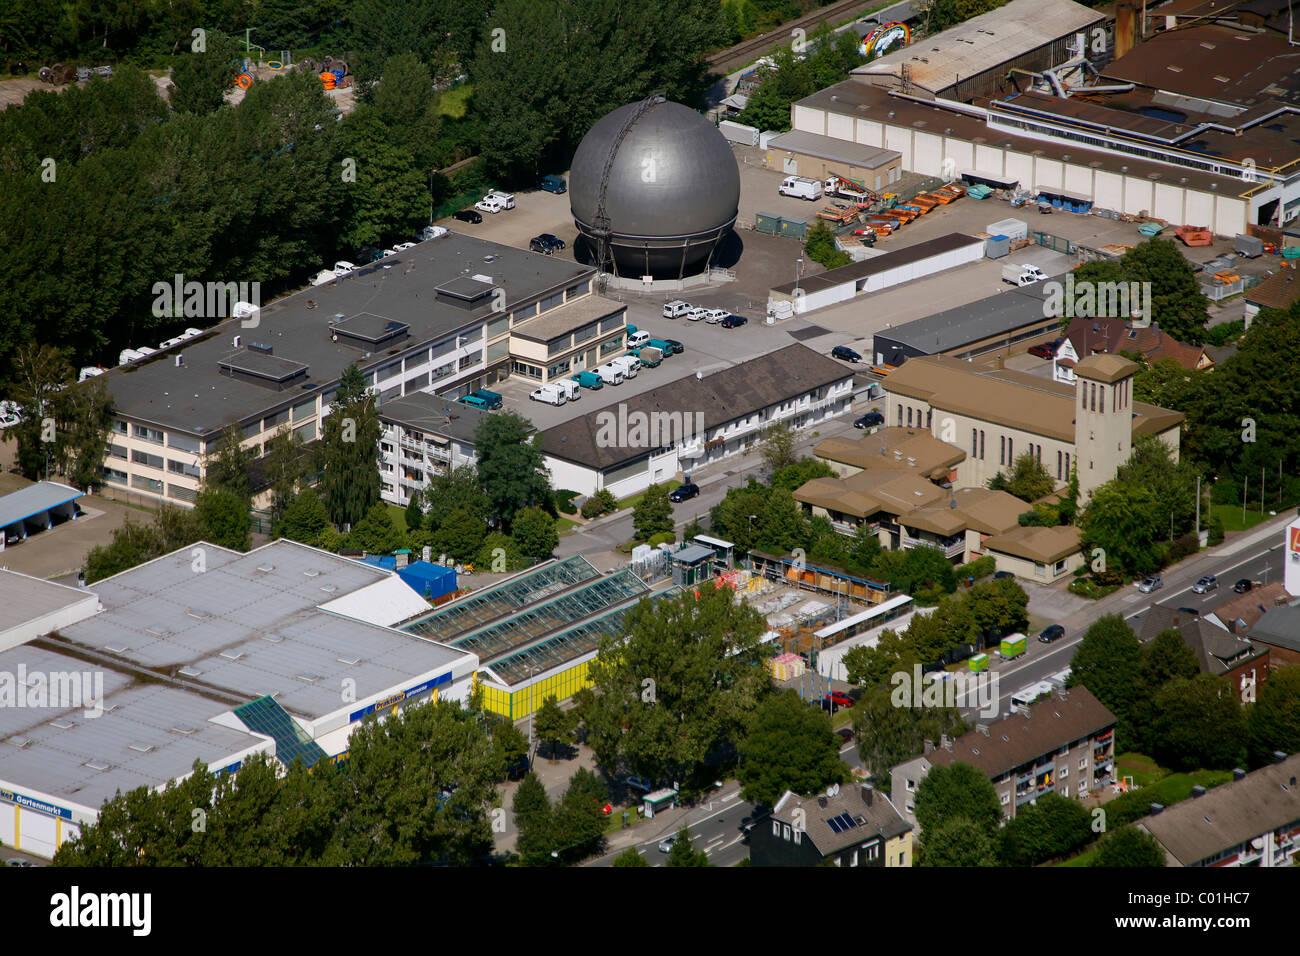 Aerial view, municipal utilities, Gevelsberg, North Rhine-Westphalia, Germany, Europe - Stock Image